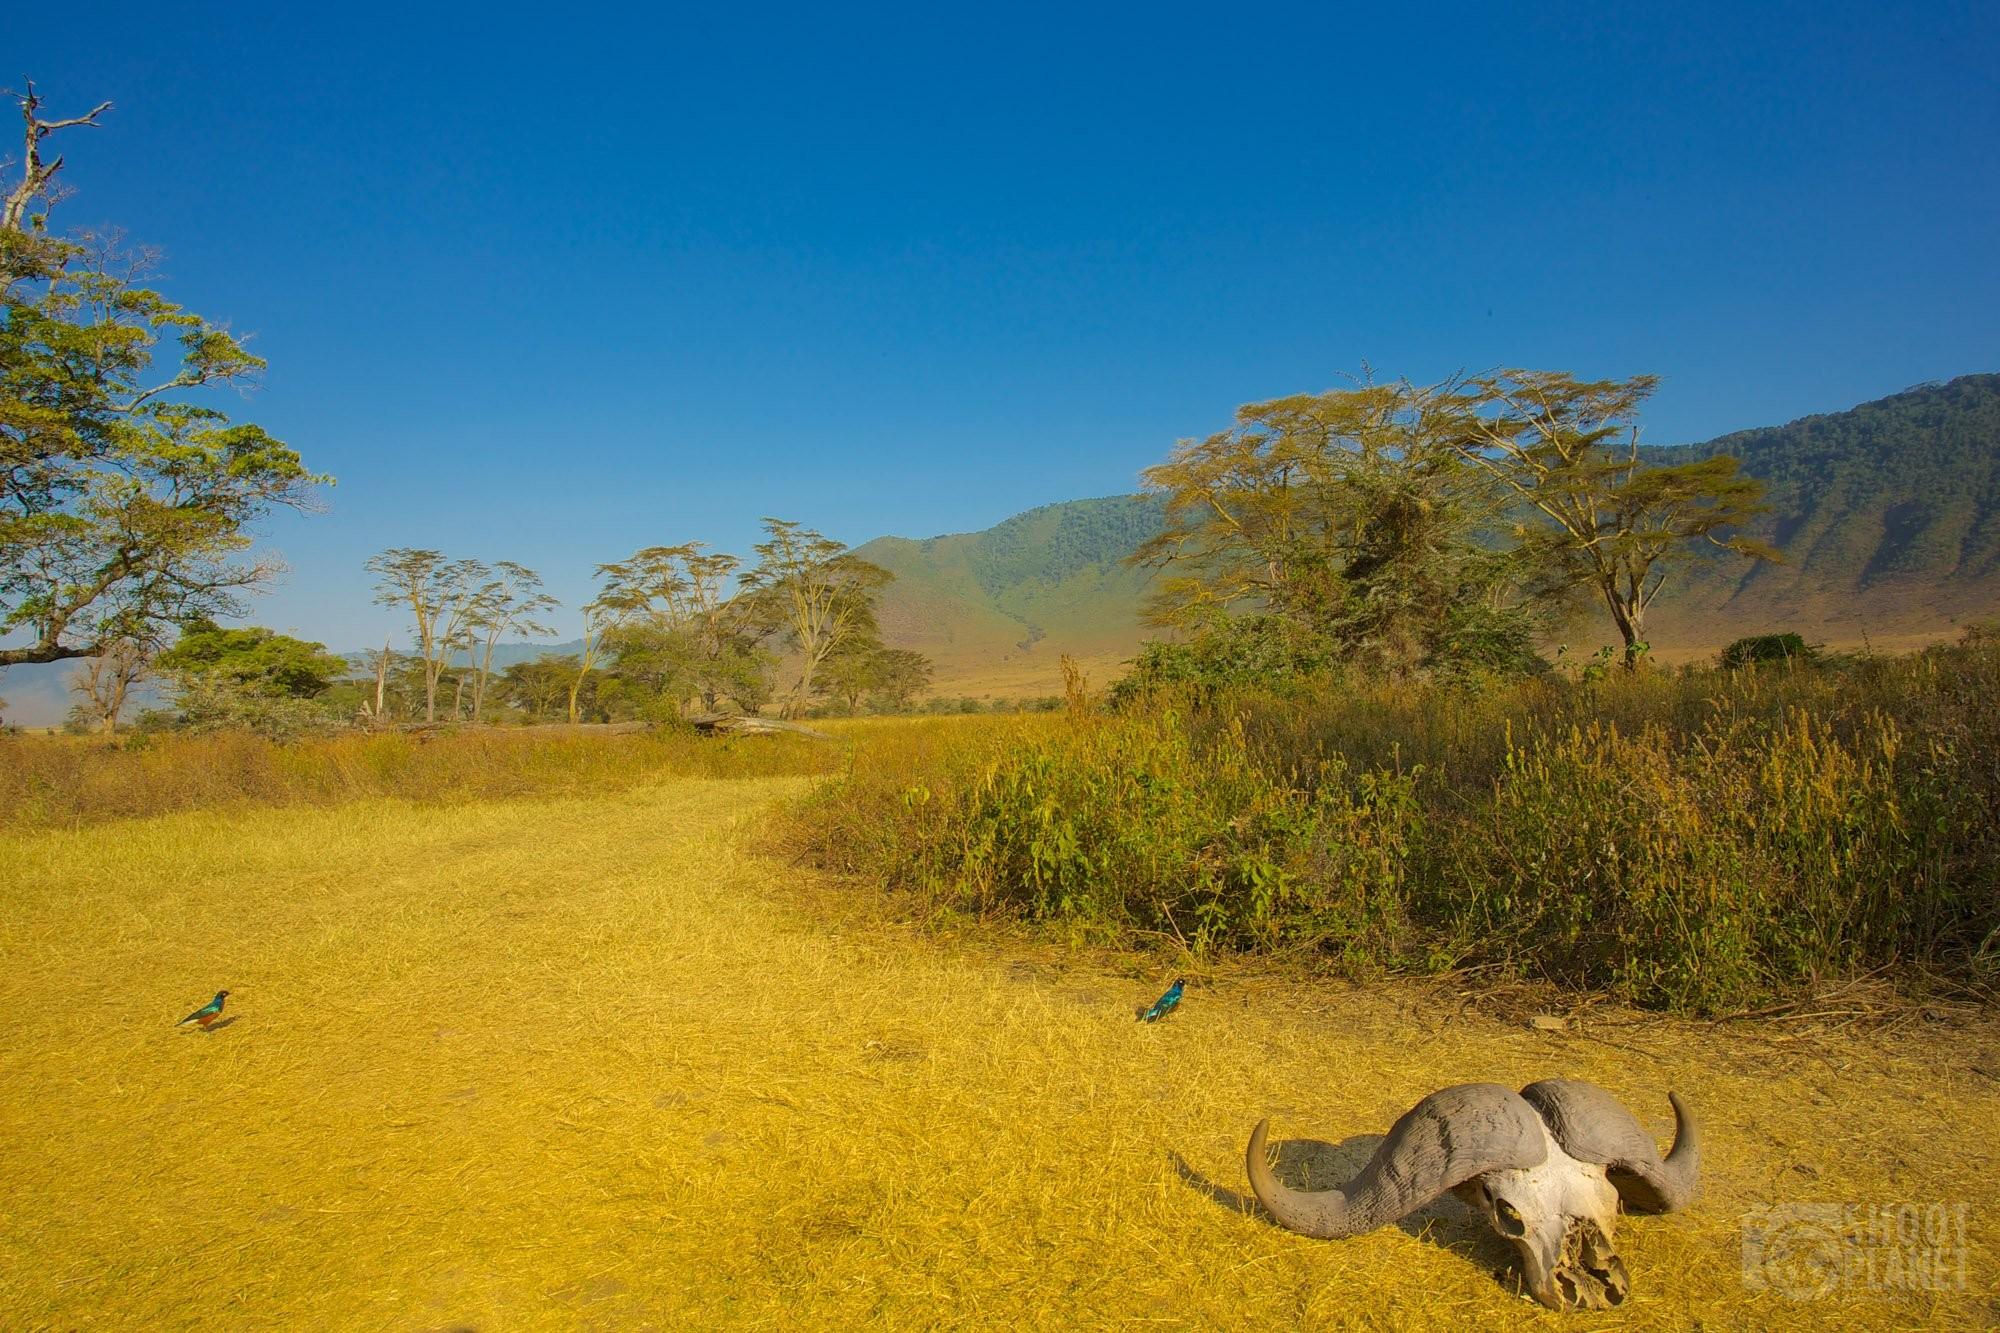 Ngoorongo crater buffalo skeleton head, Tanzania